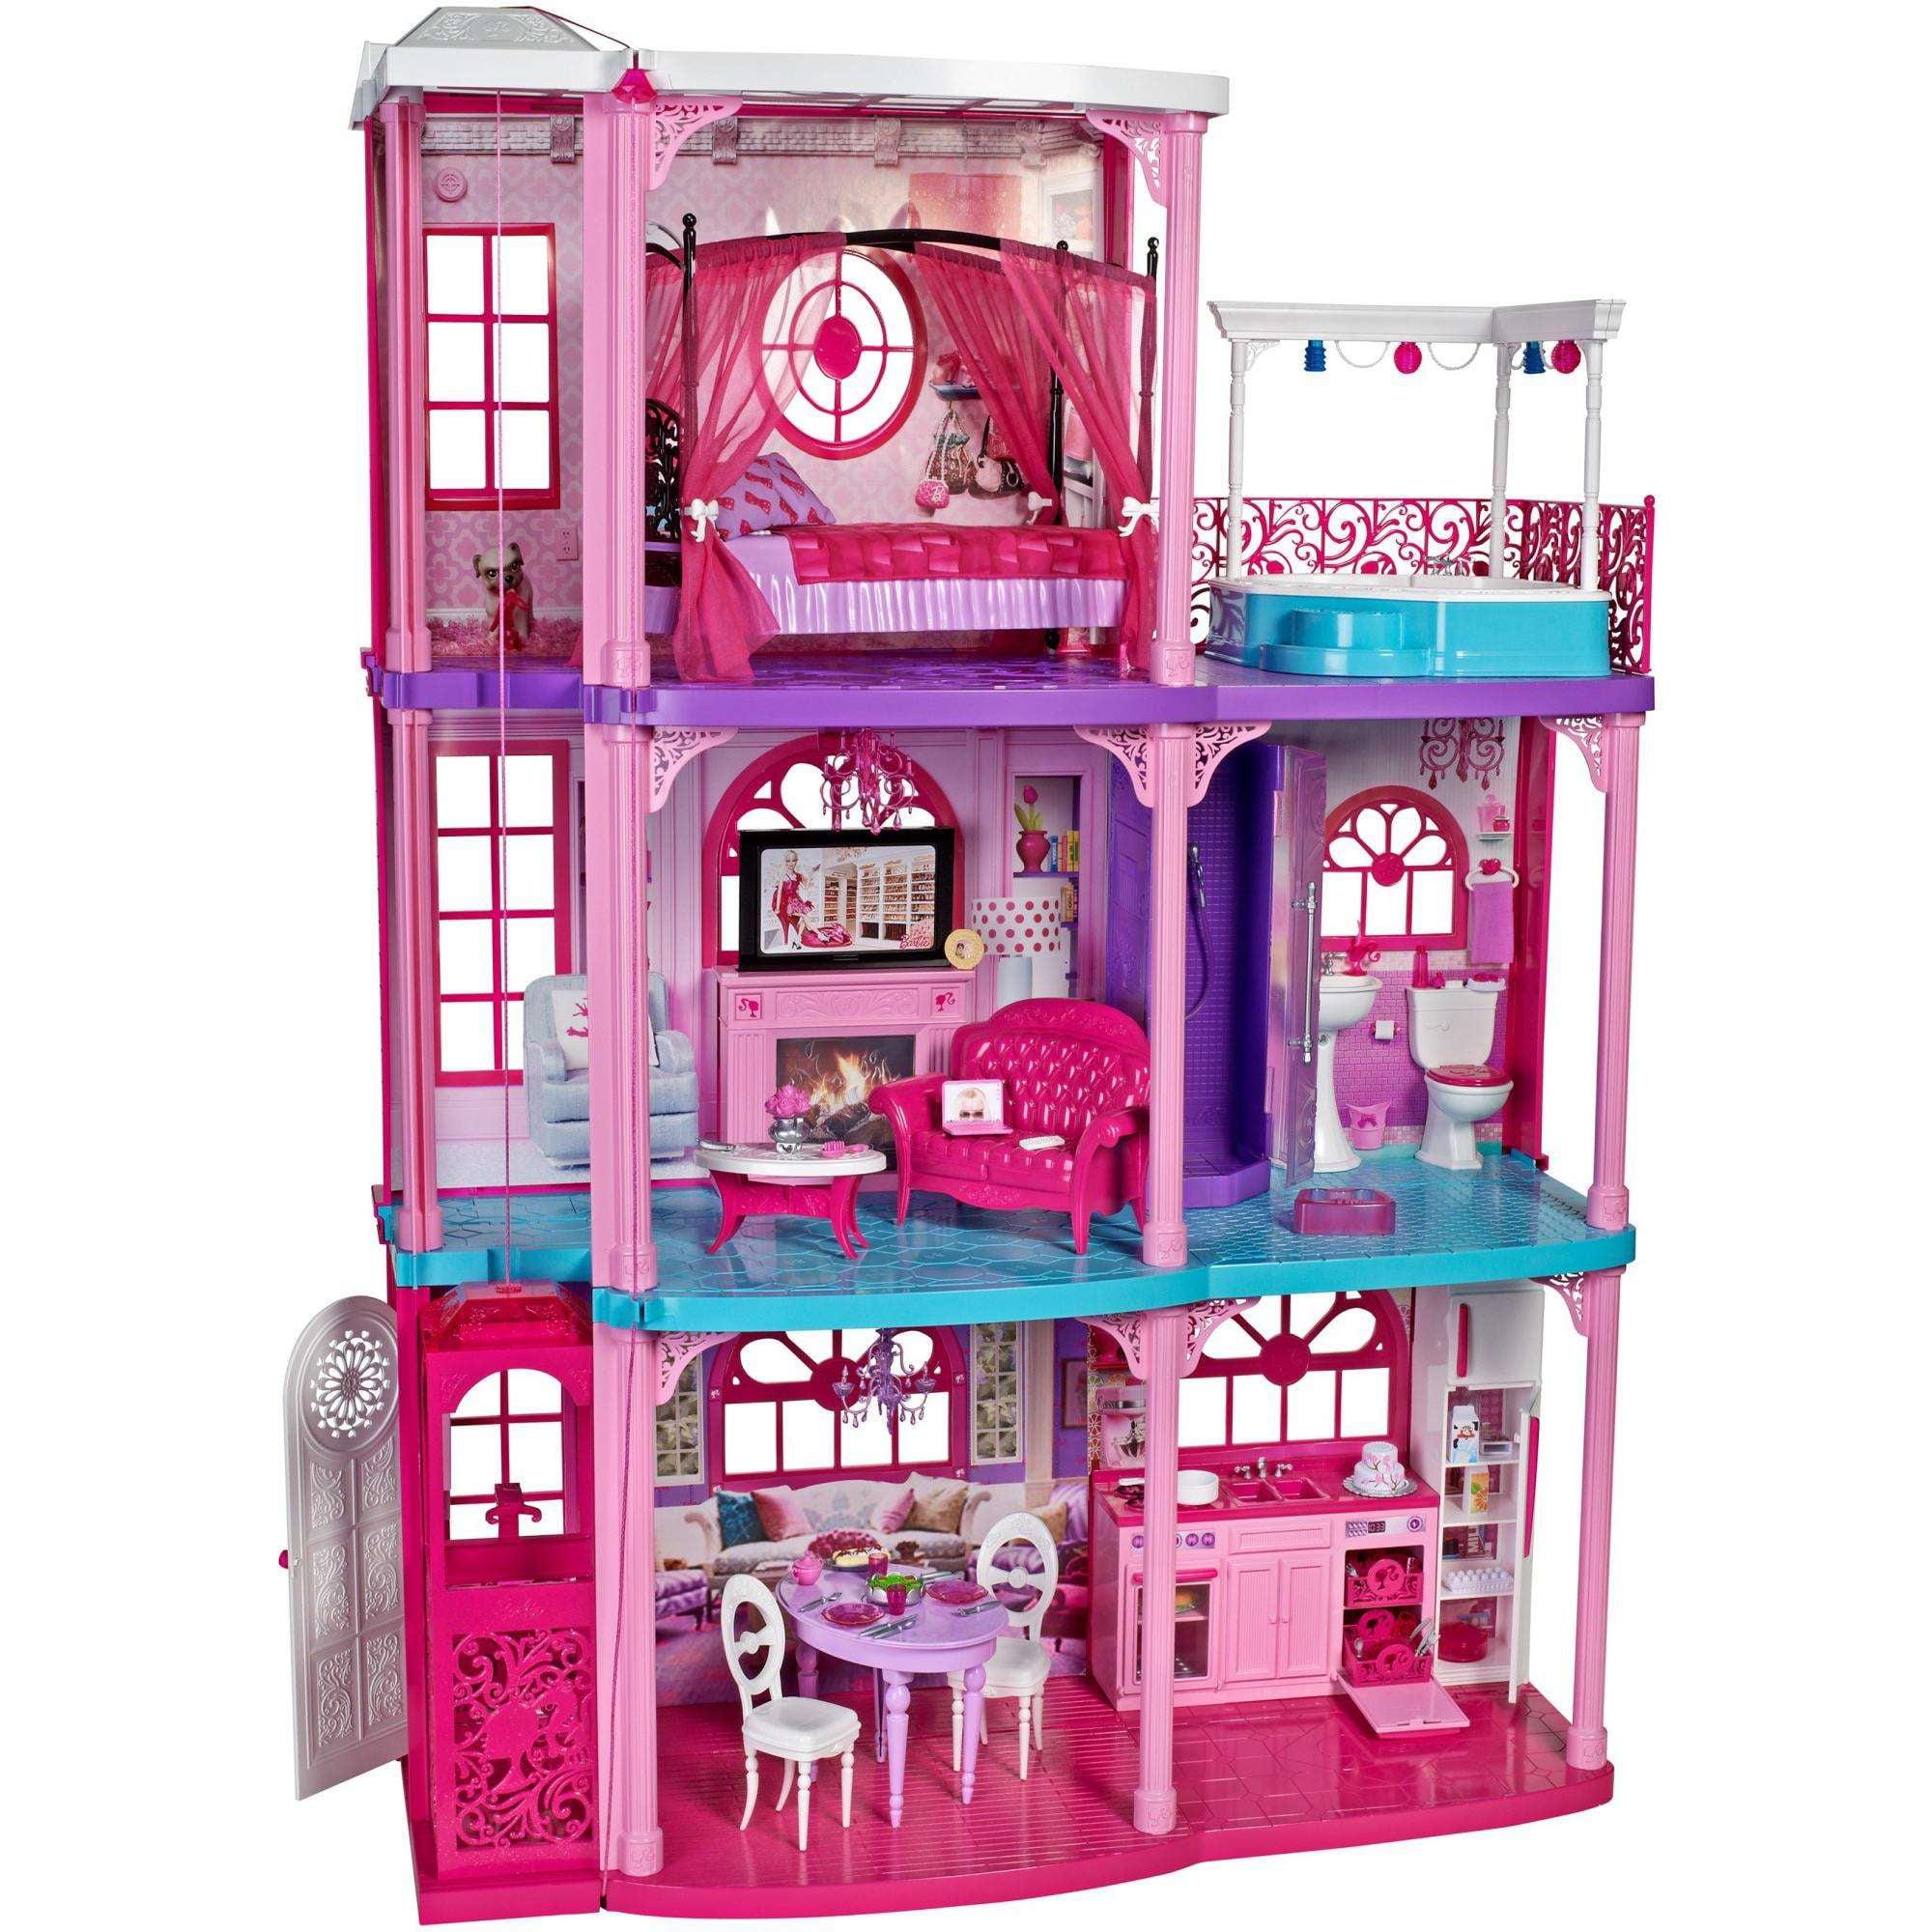 Mattel Barbie 3 Story Dreamhouse